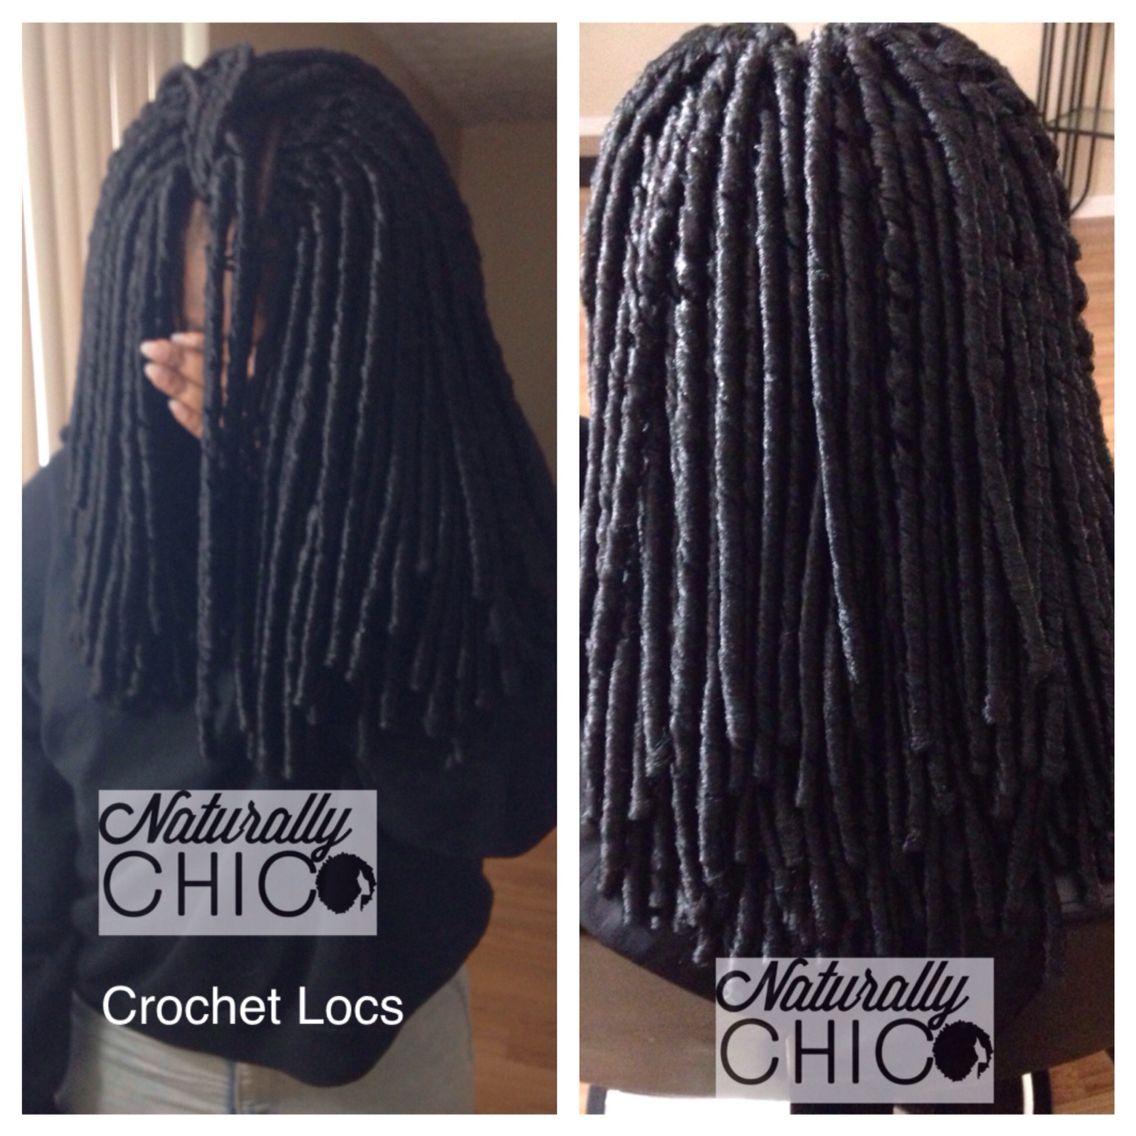 Crochet Locs Hair Used Kima Braid Soft Dreadlock 6 Packs Color 1